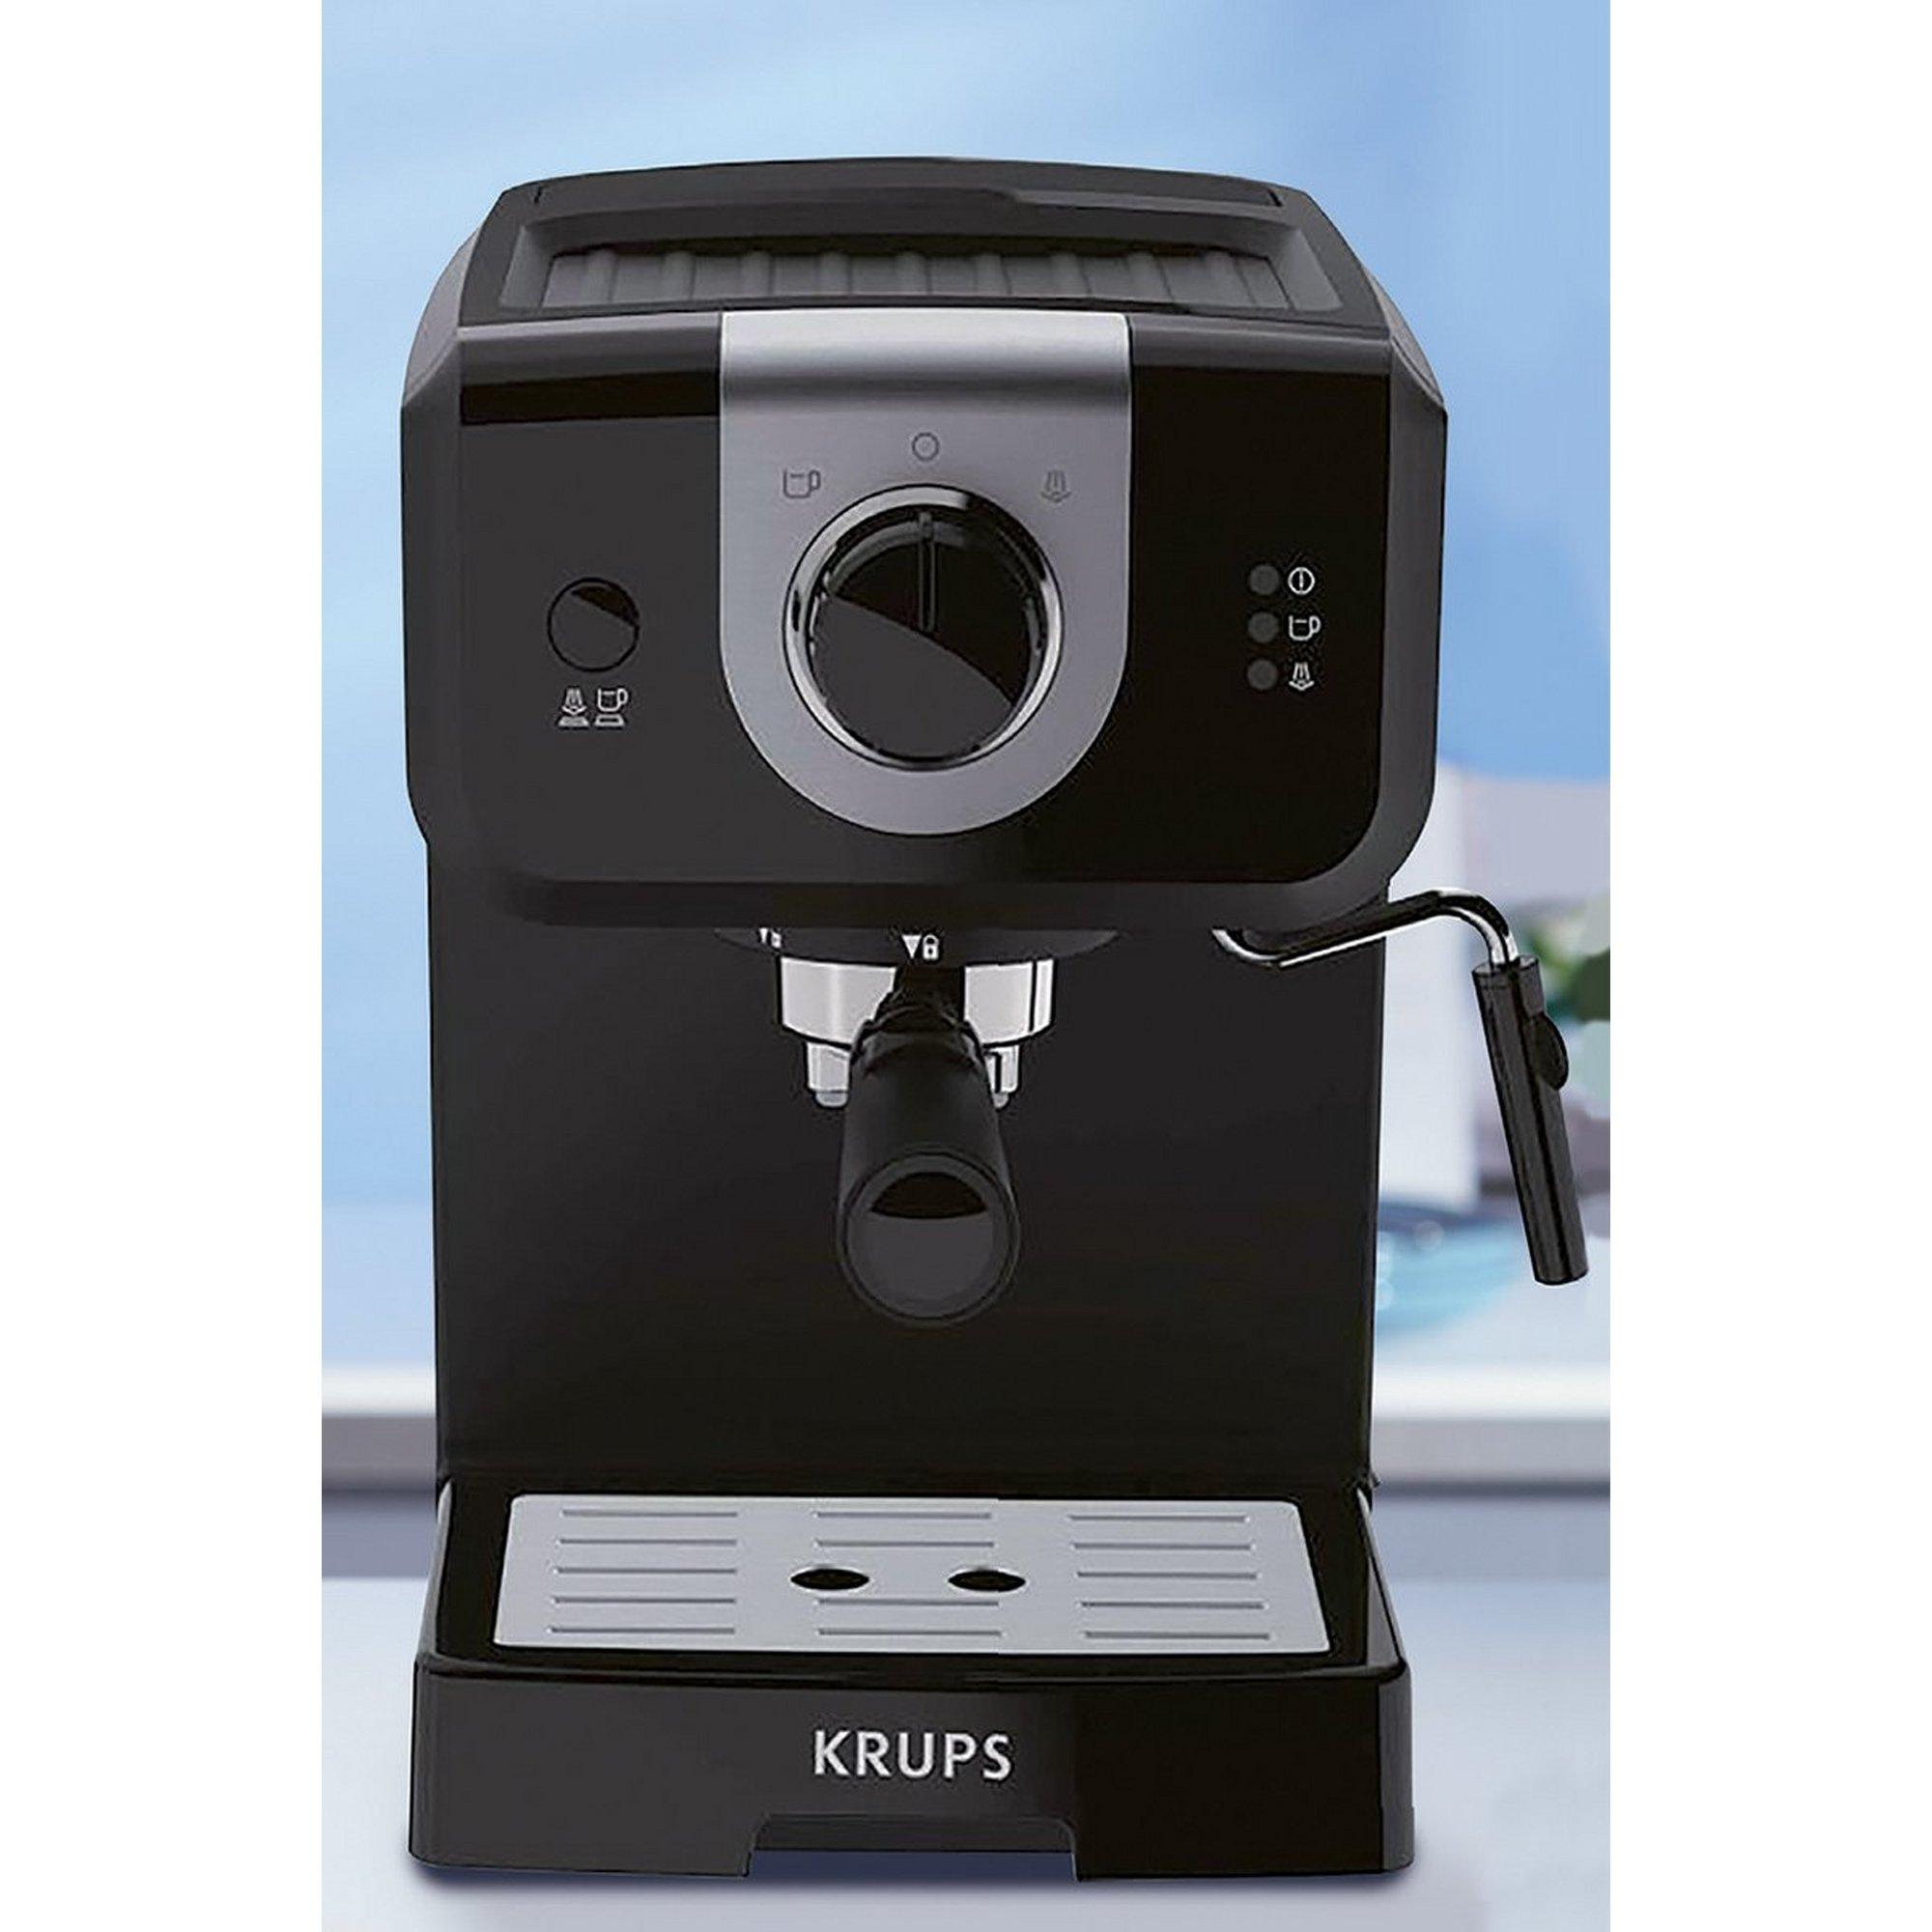 Image of Krups Opio Espresso Steam and Pump Coffee Machine